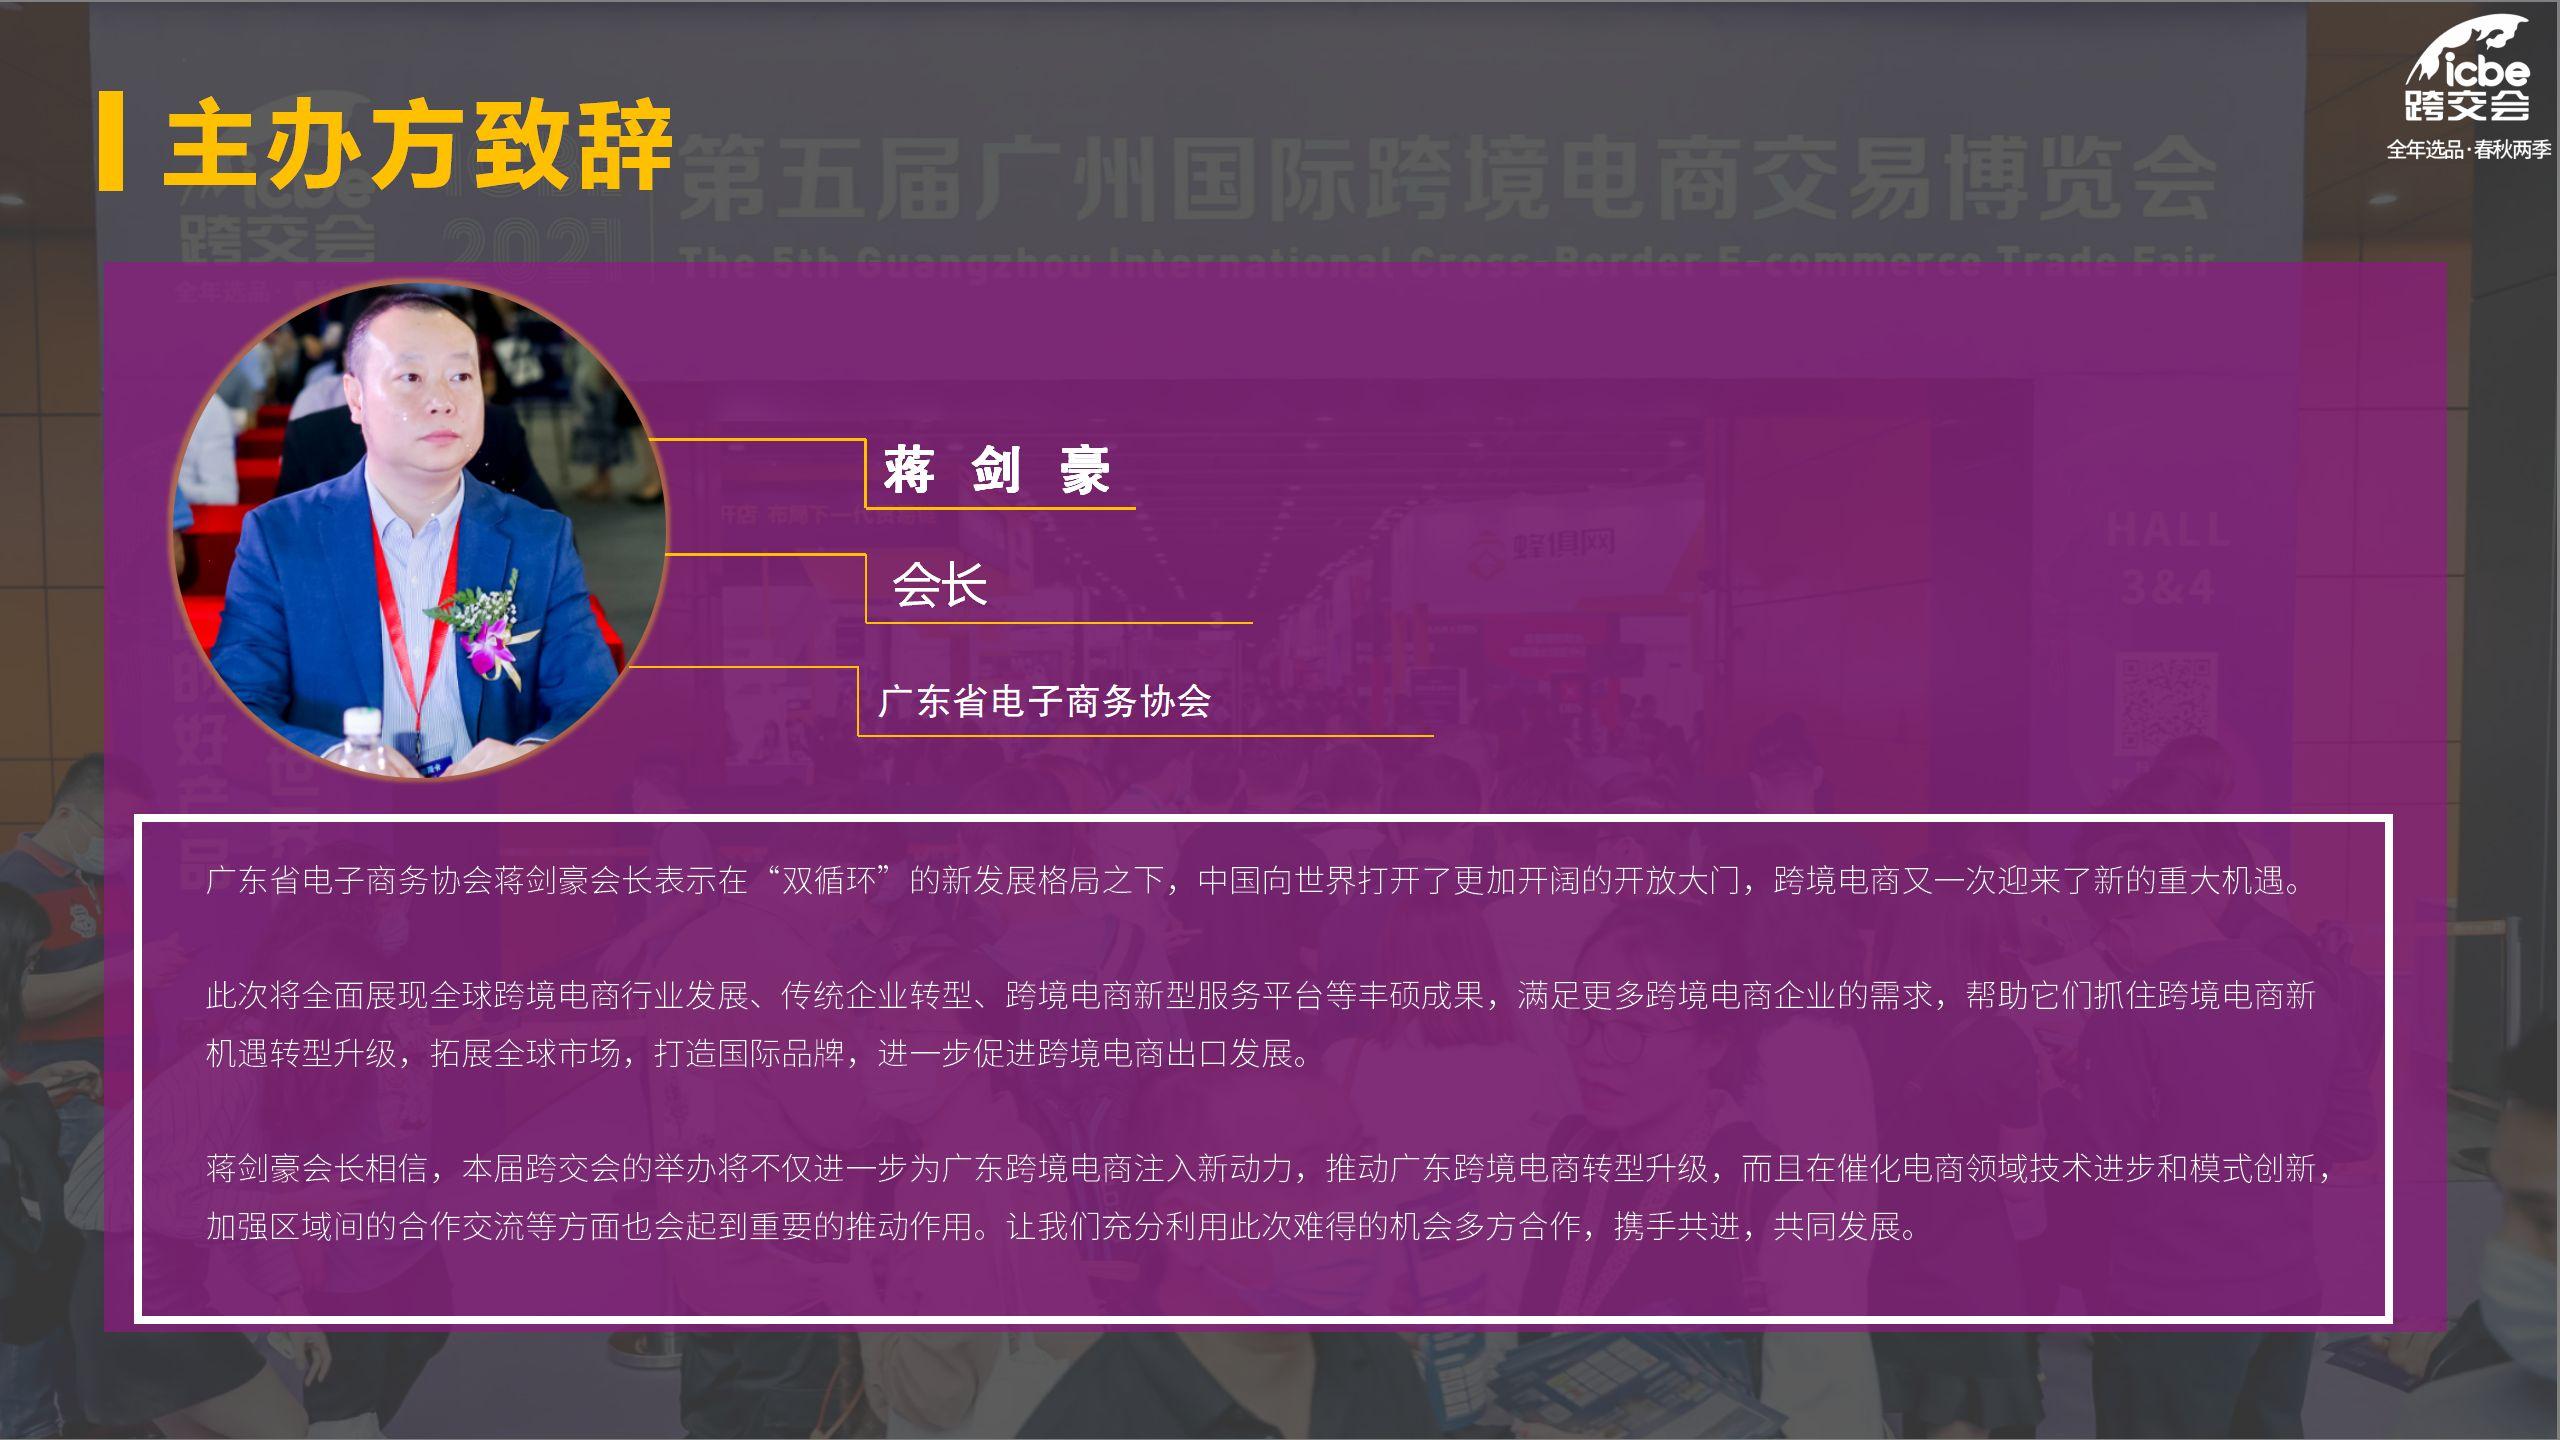 广州展后报告png